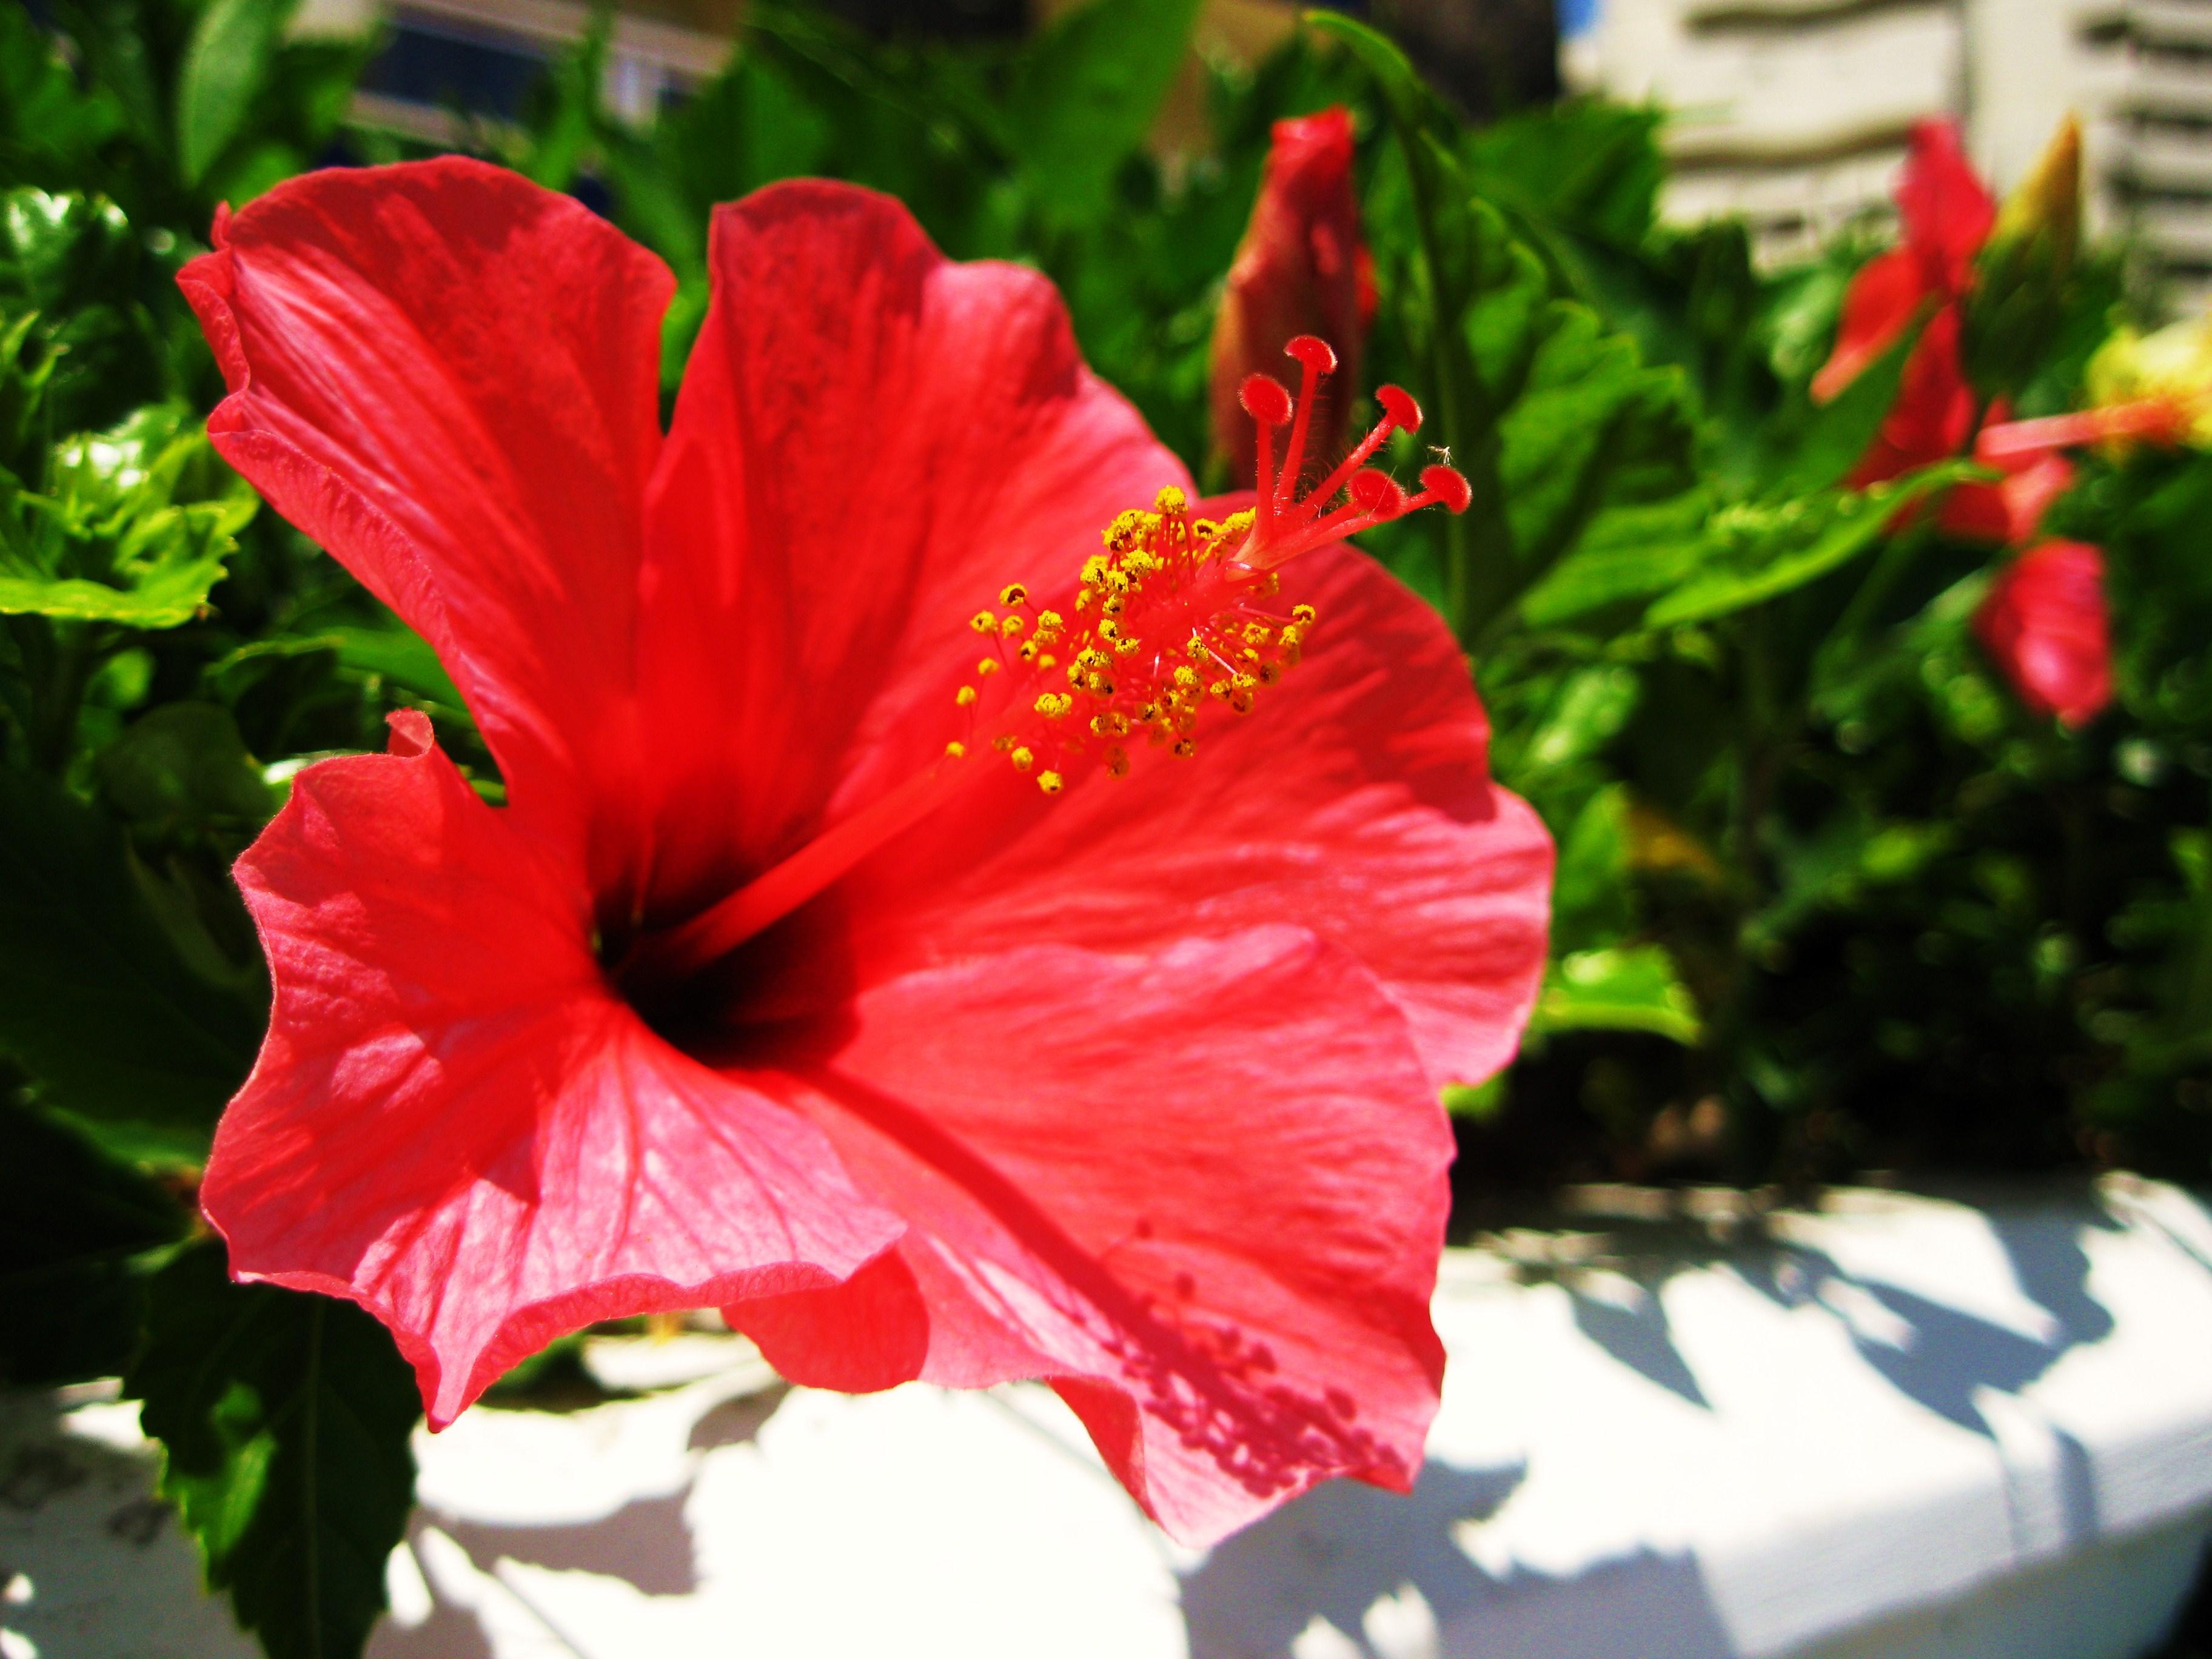 Fotos de benalmdena of fountains and flowers days 5 and 6 how beautiful izmirmasajfo